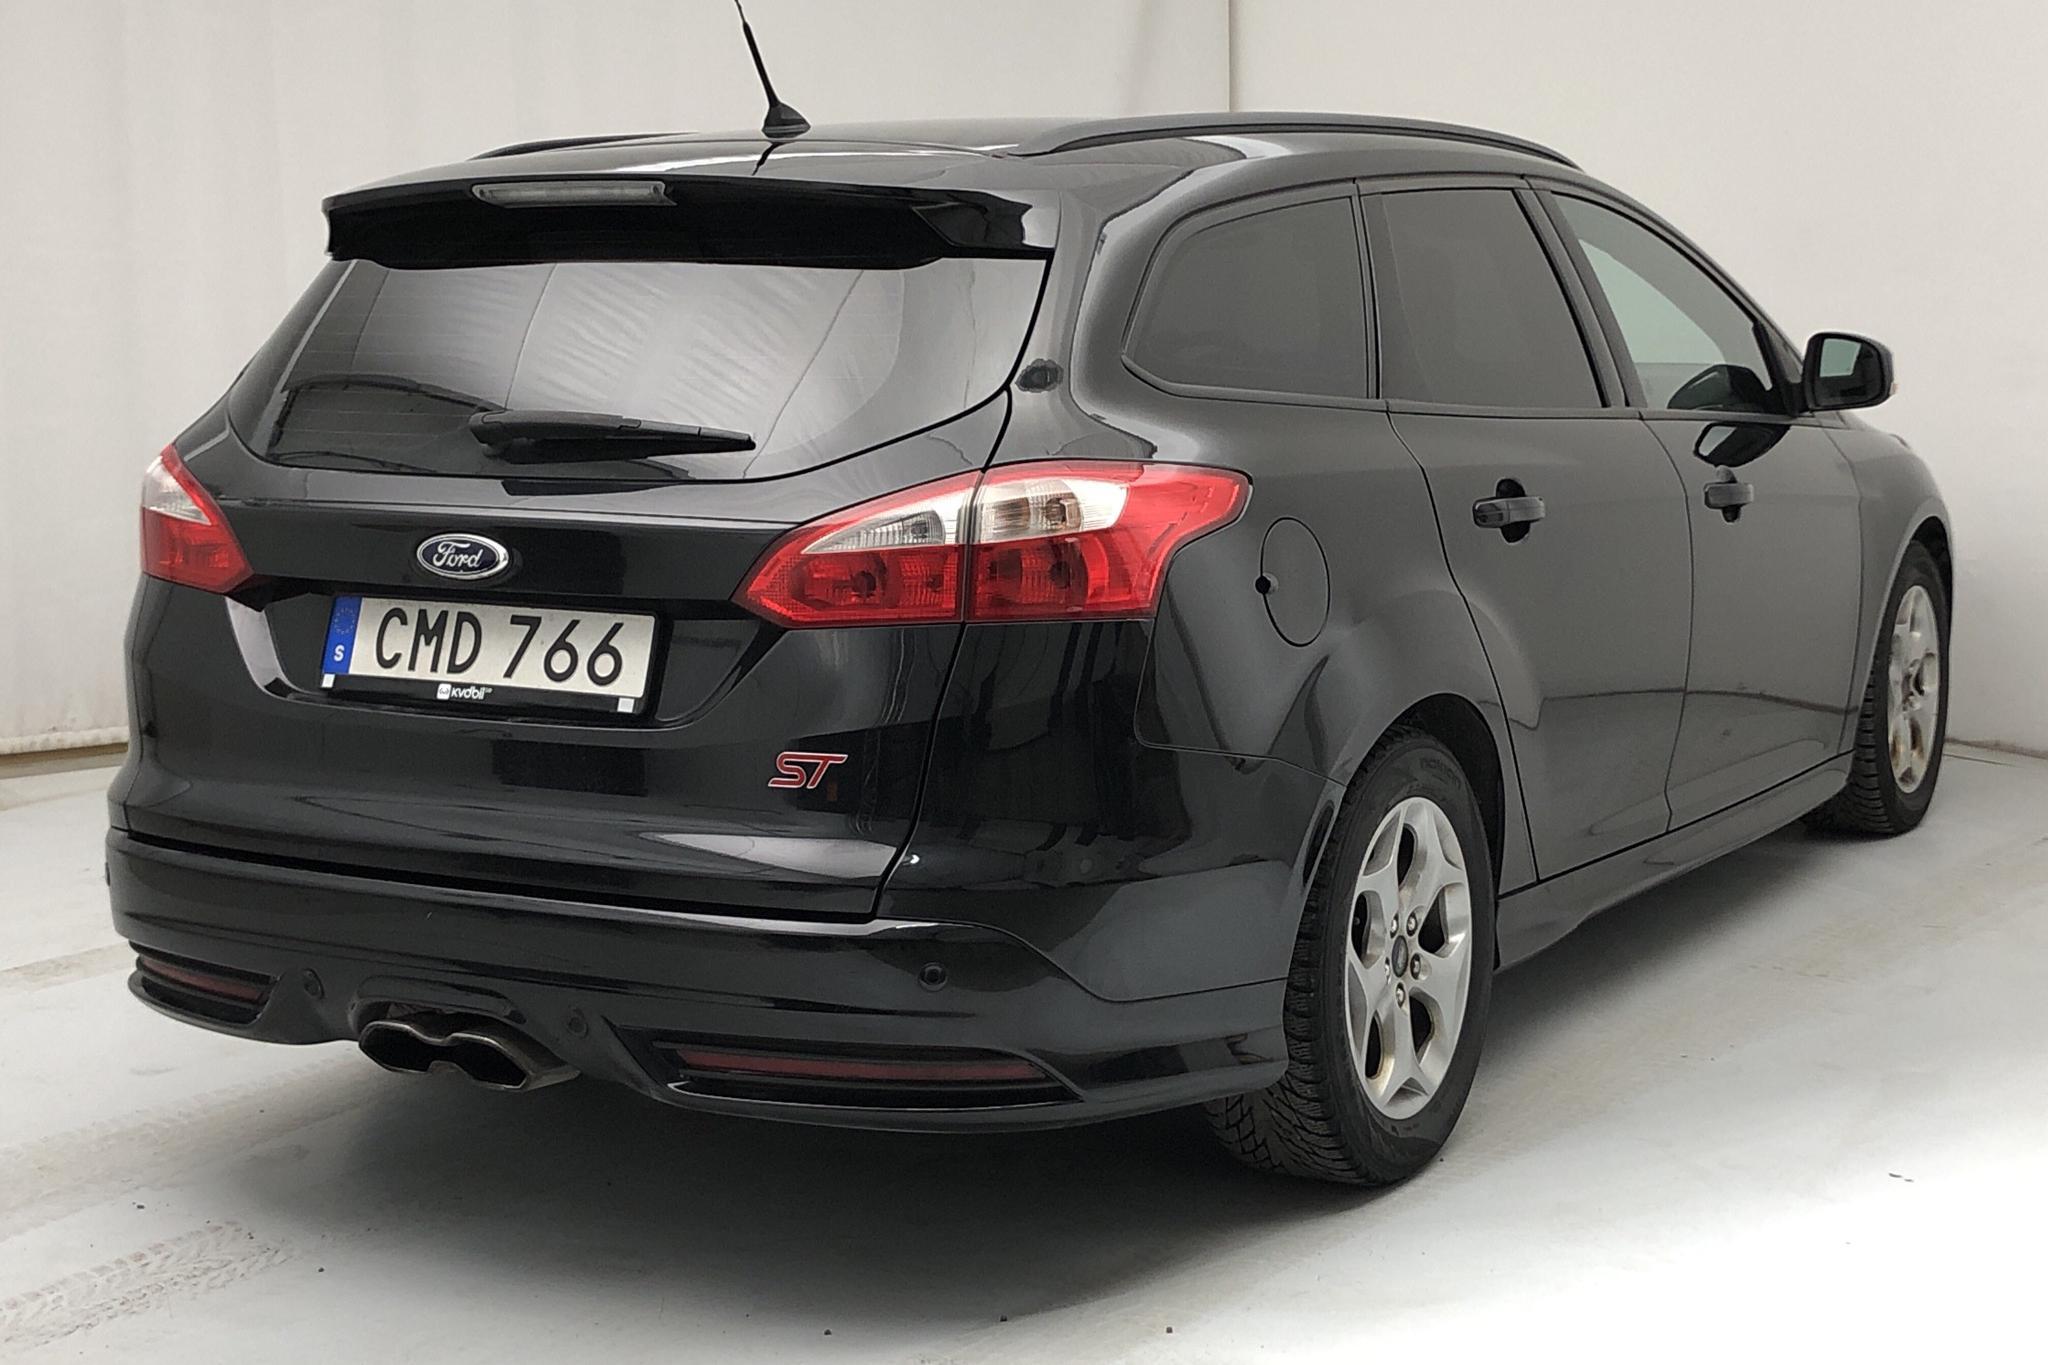 Ford Focus 2.0 ST EcoBoost Kombi (250hk) - 112 540 km - Manual - black - 2014